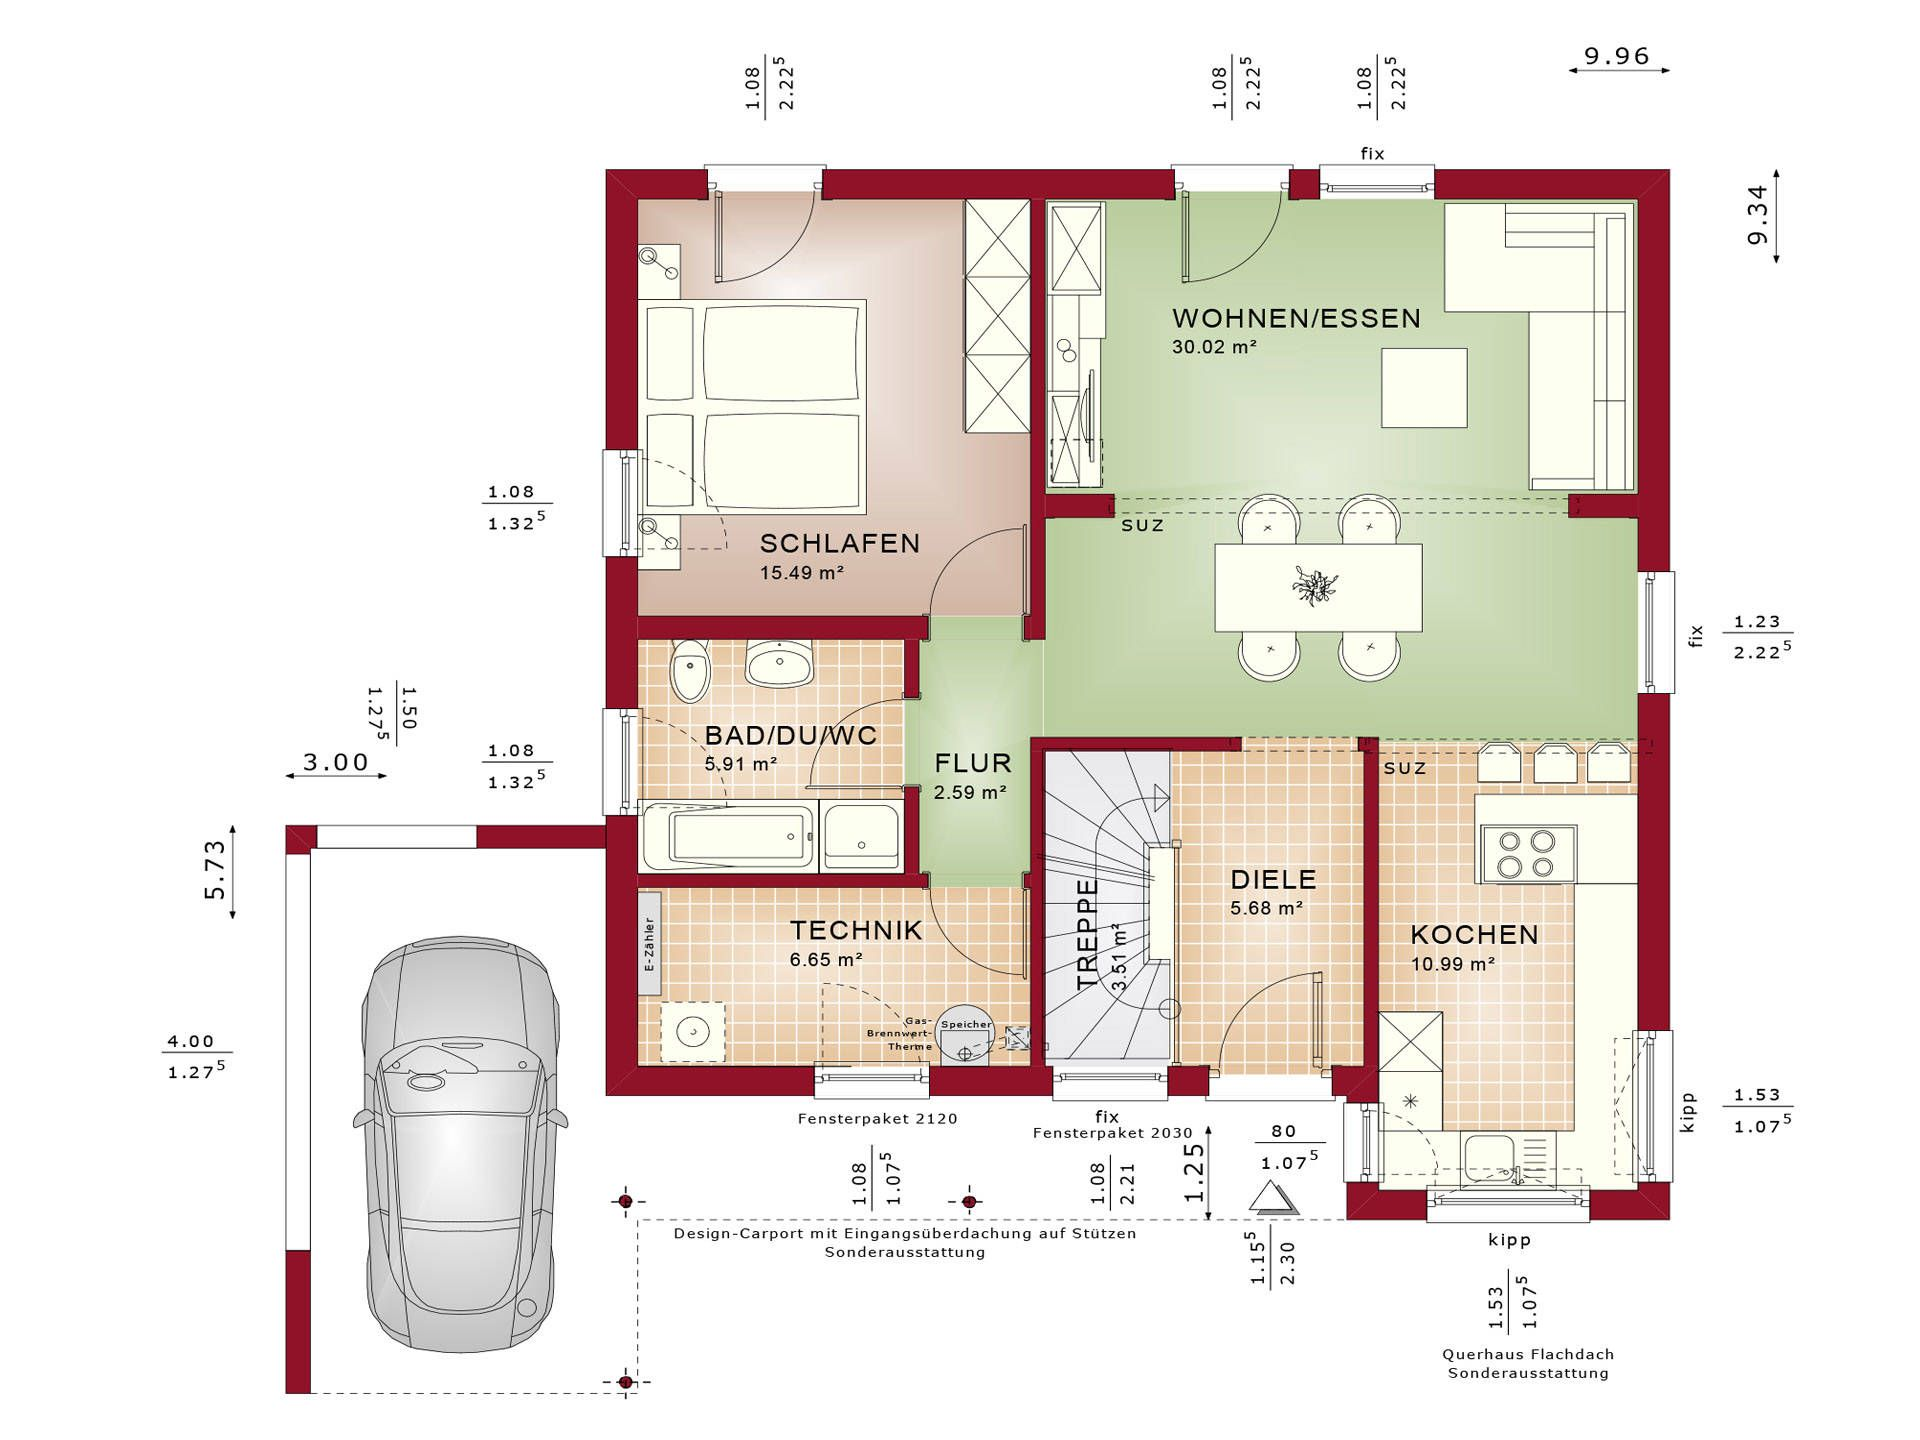 haus solution 78 v10 grundriss eg von living haus bungalow pinterest. Black Bedroom Furniture Sets. Home Design Ideas